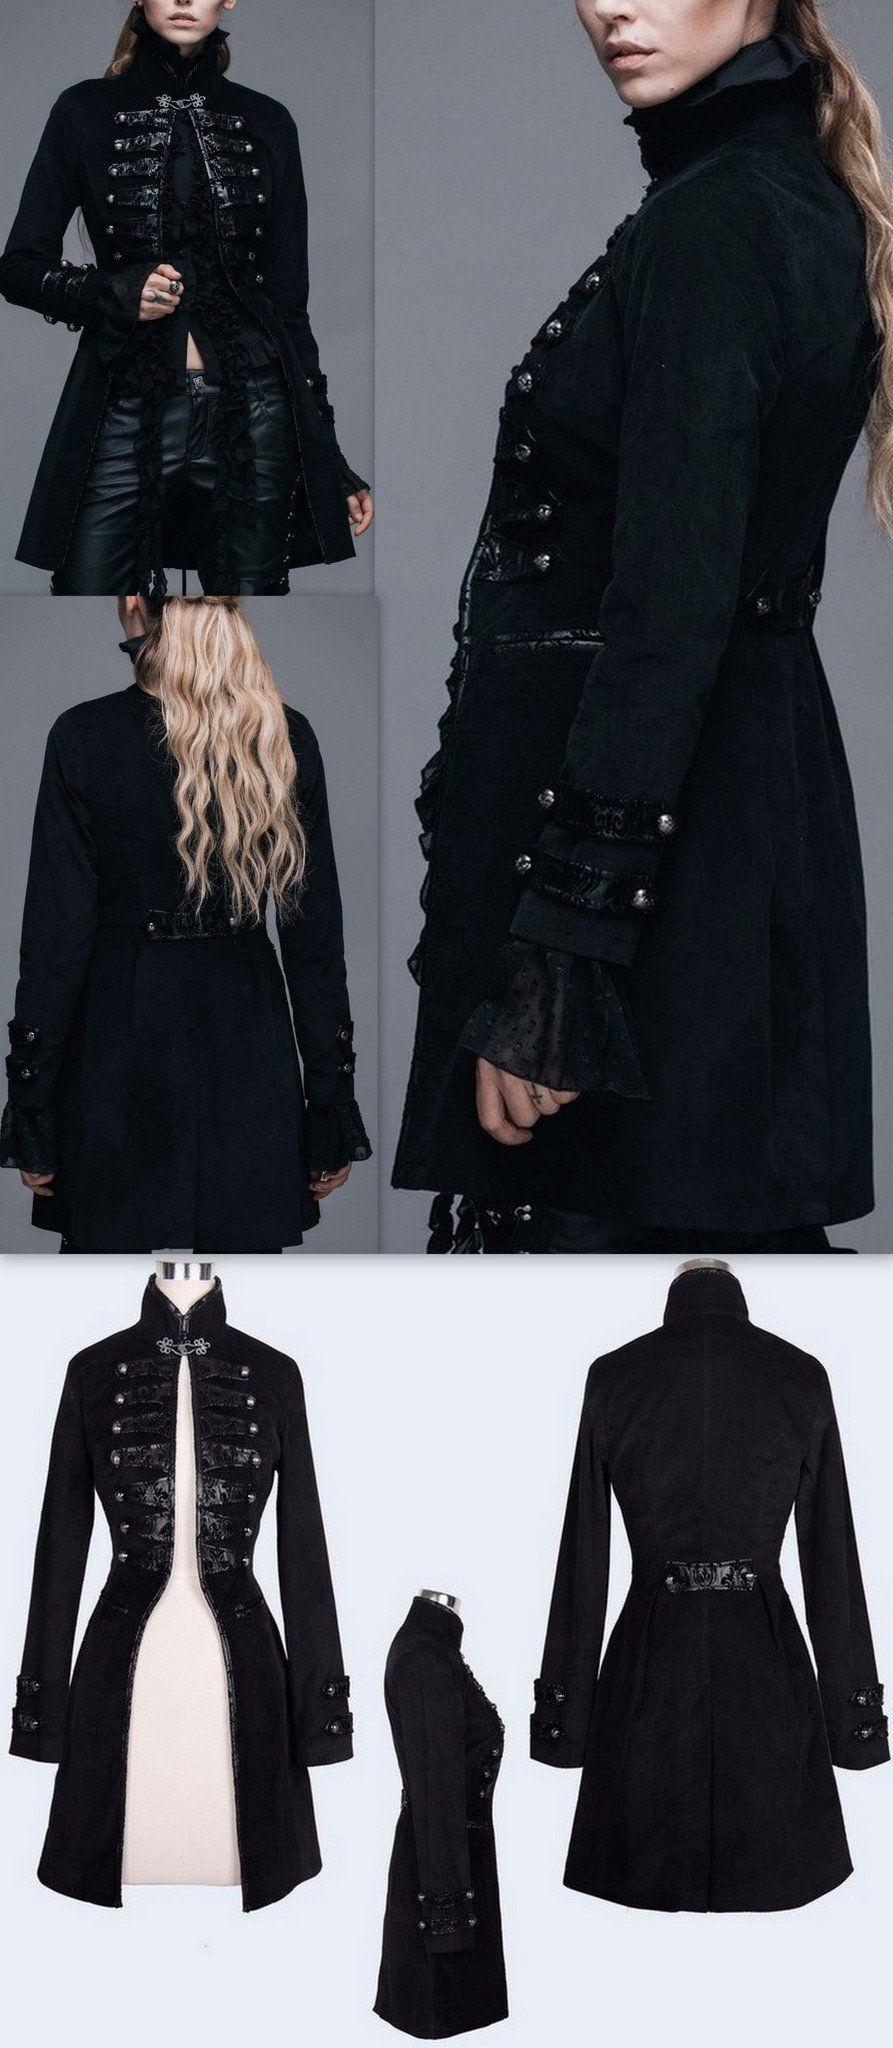 Black Victorian Military Coat